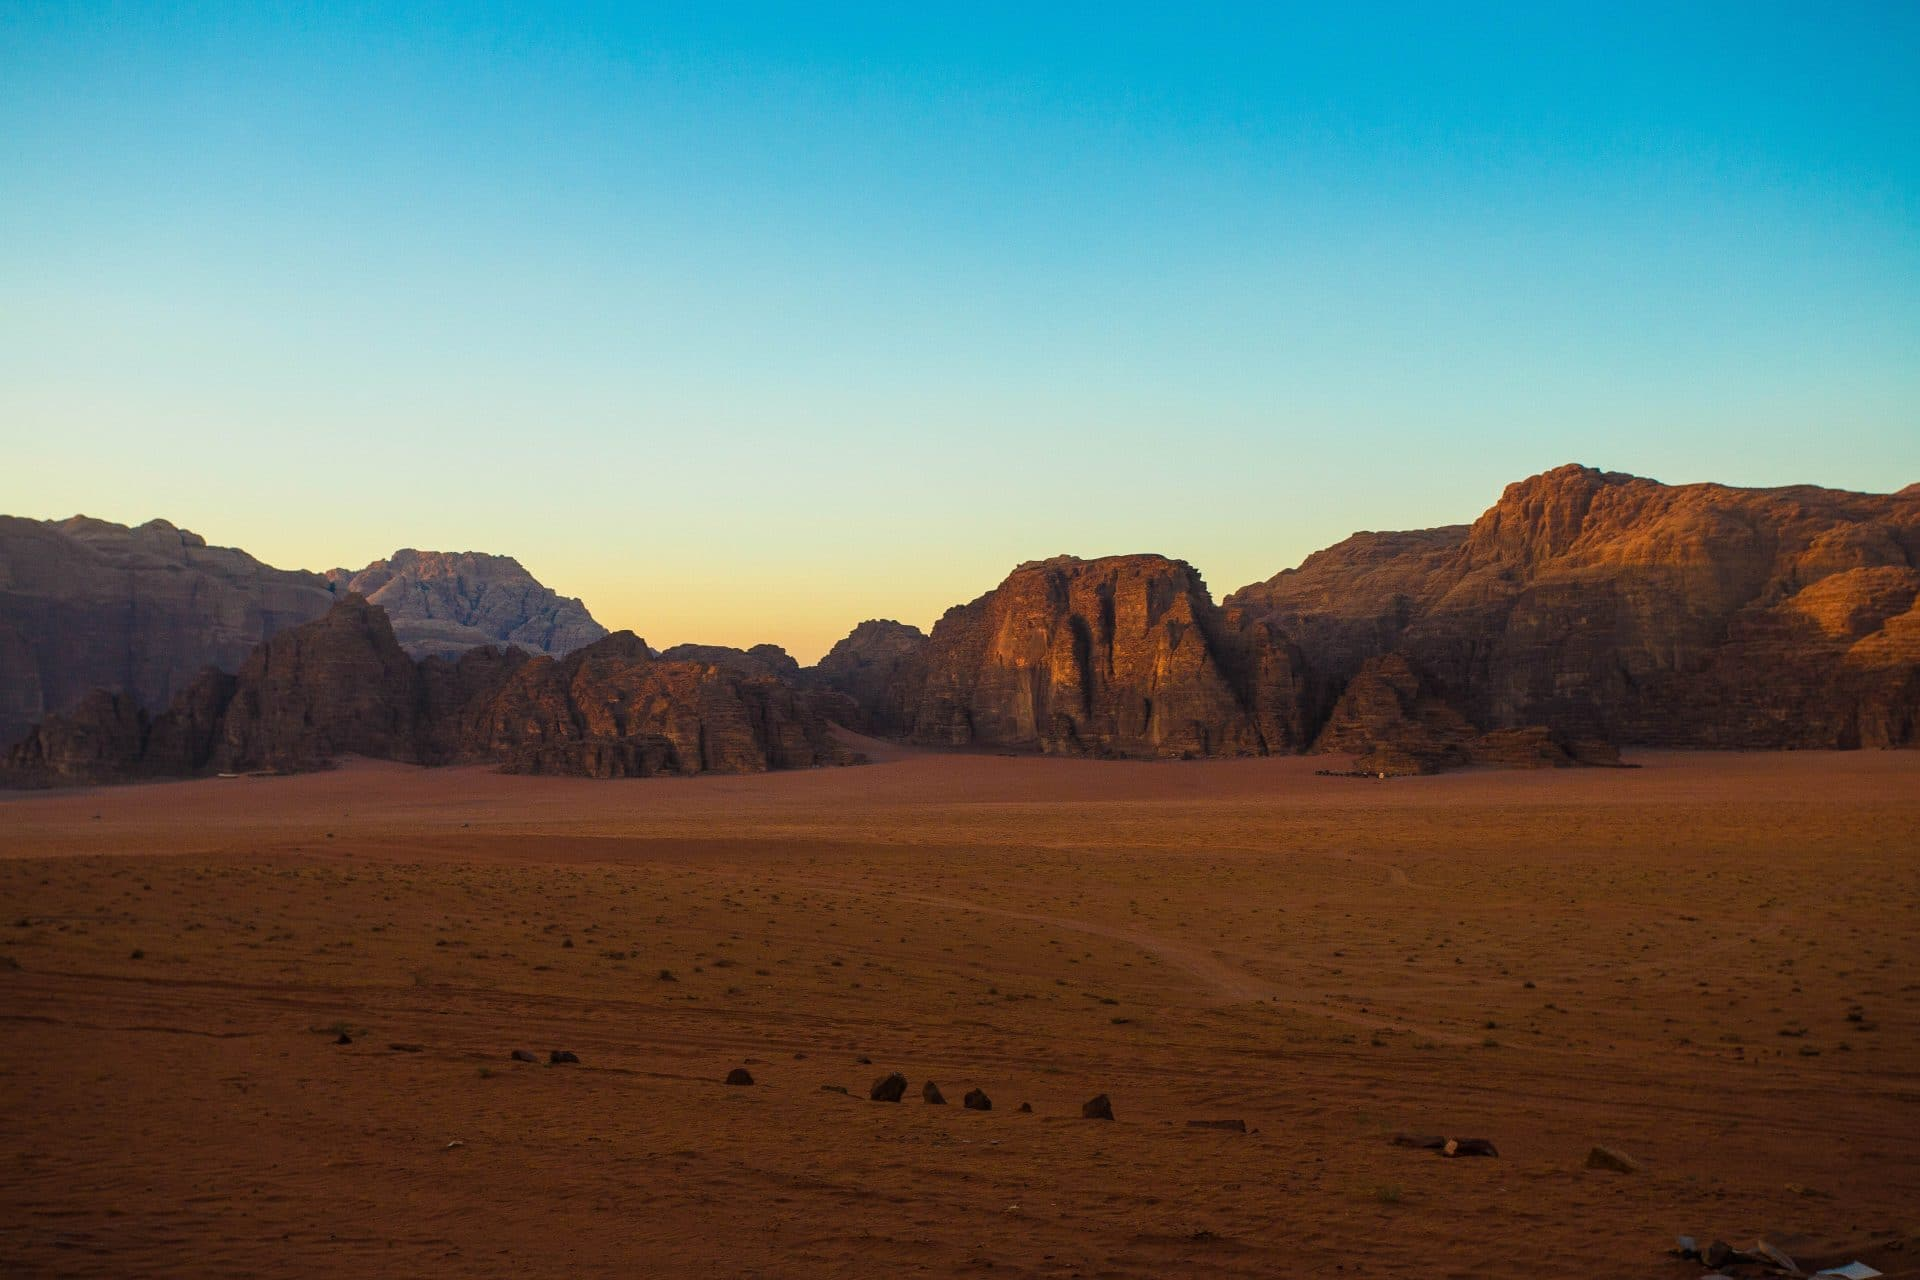 Jeep tour of Wadi Rum Jordan